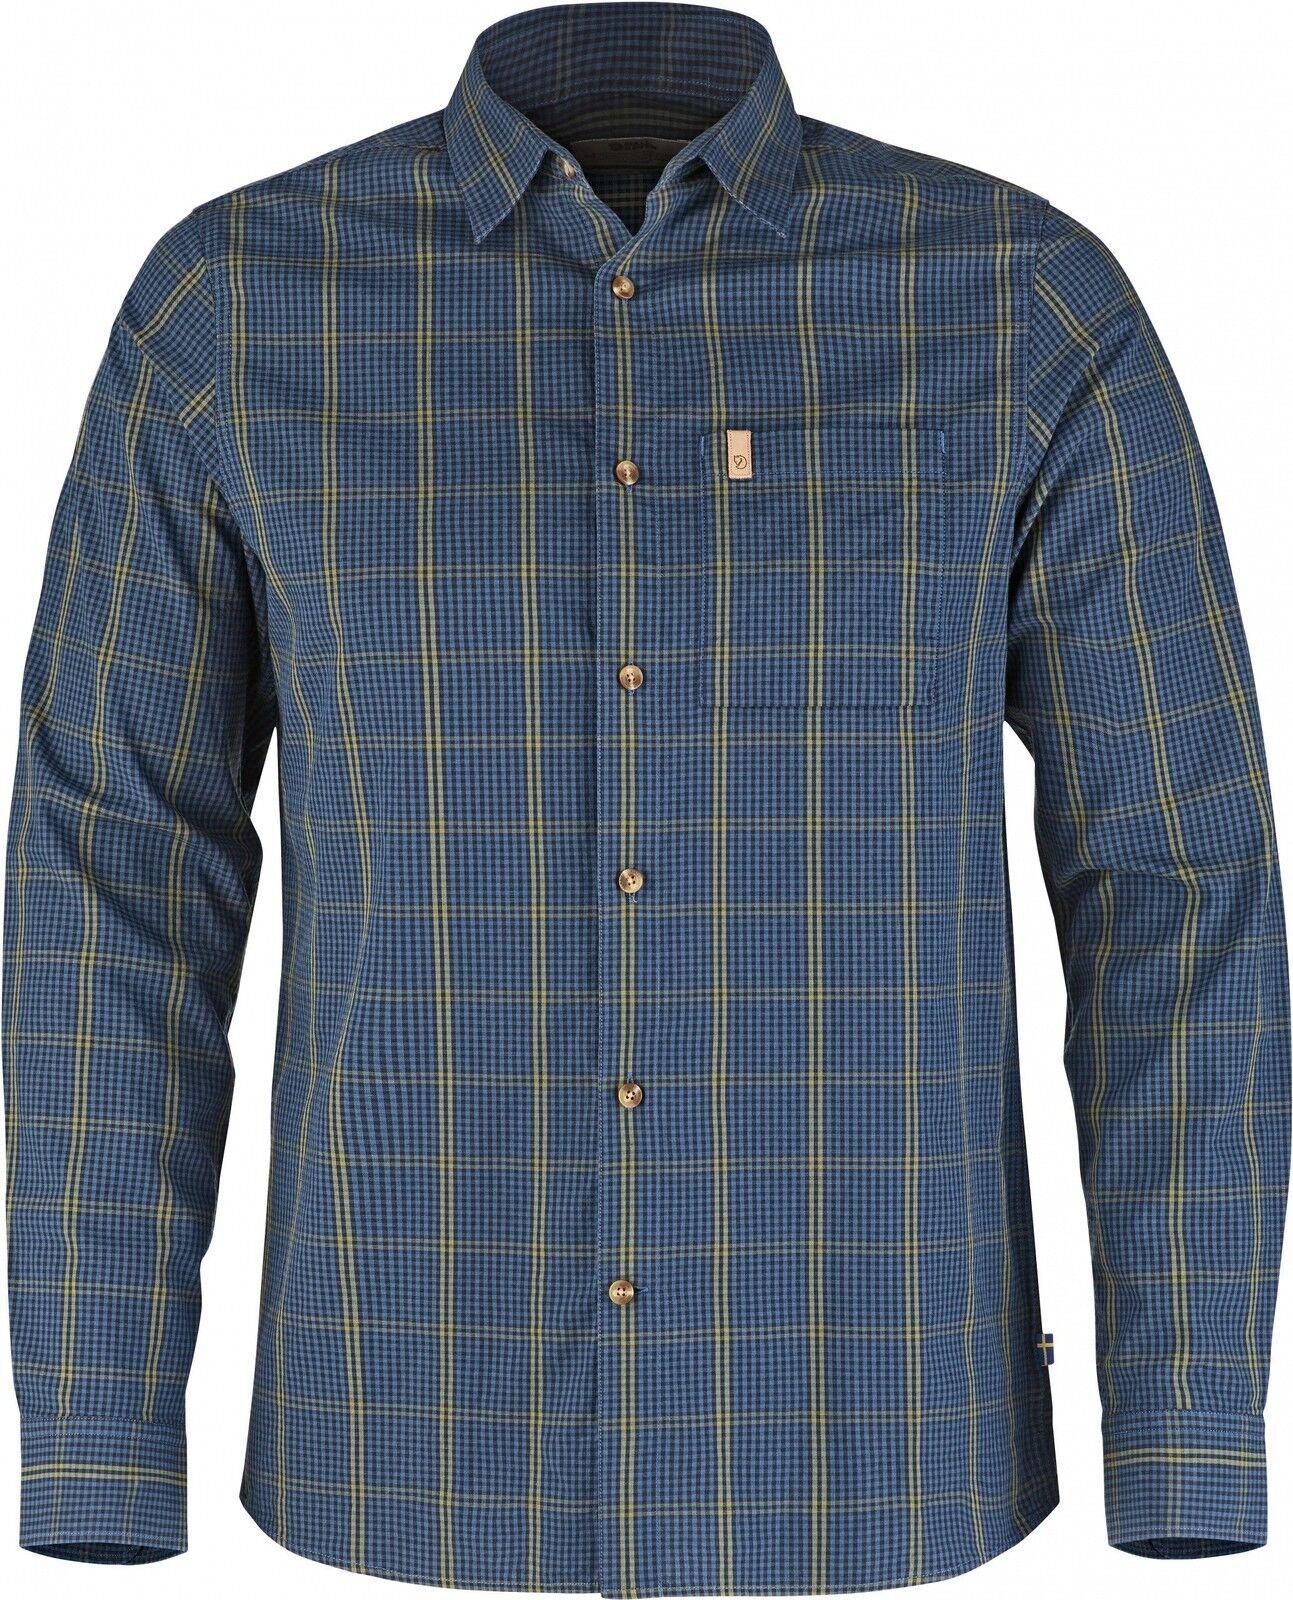 Fjäll Räven Kiruna Camiseta Camisa de hombre manga  larga, algodón, Uncle bluee  buy cheap